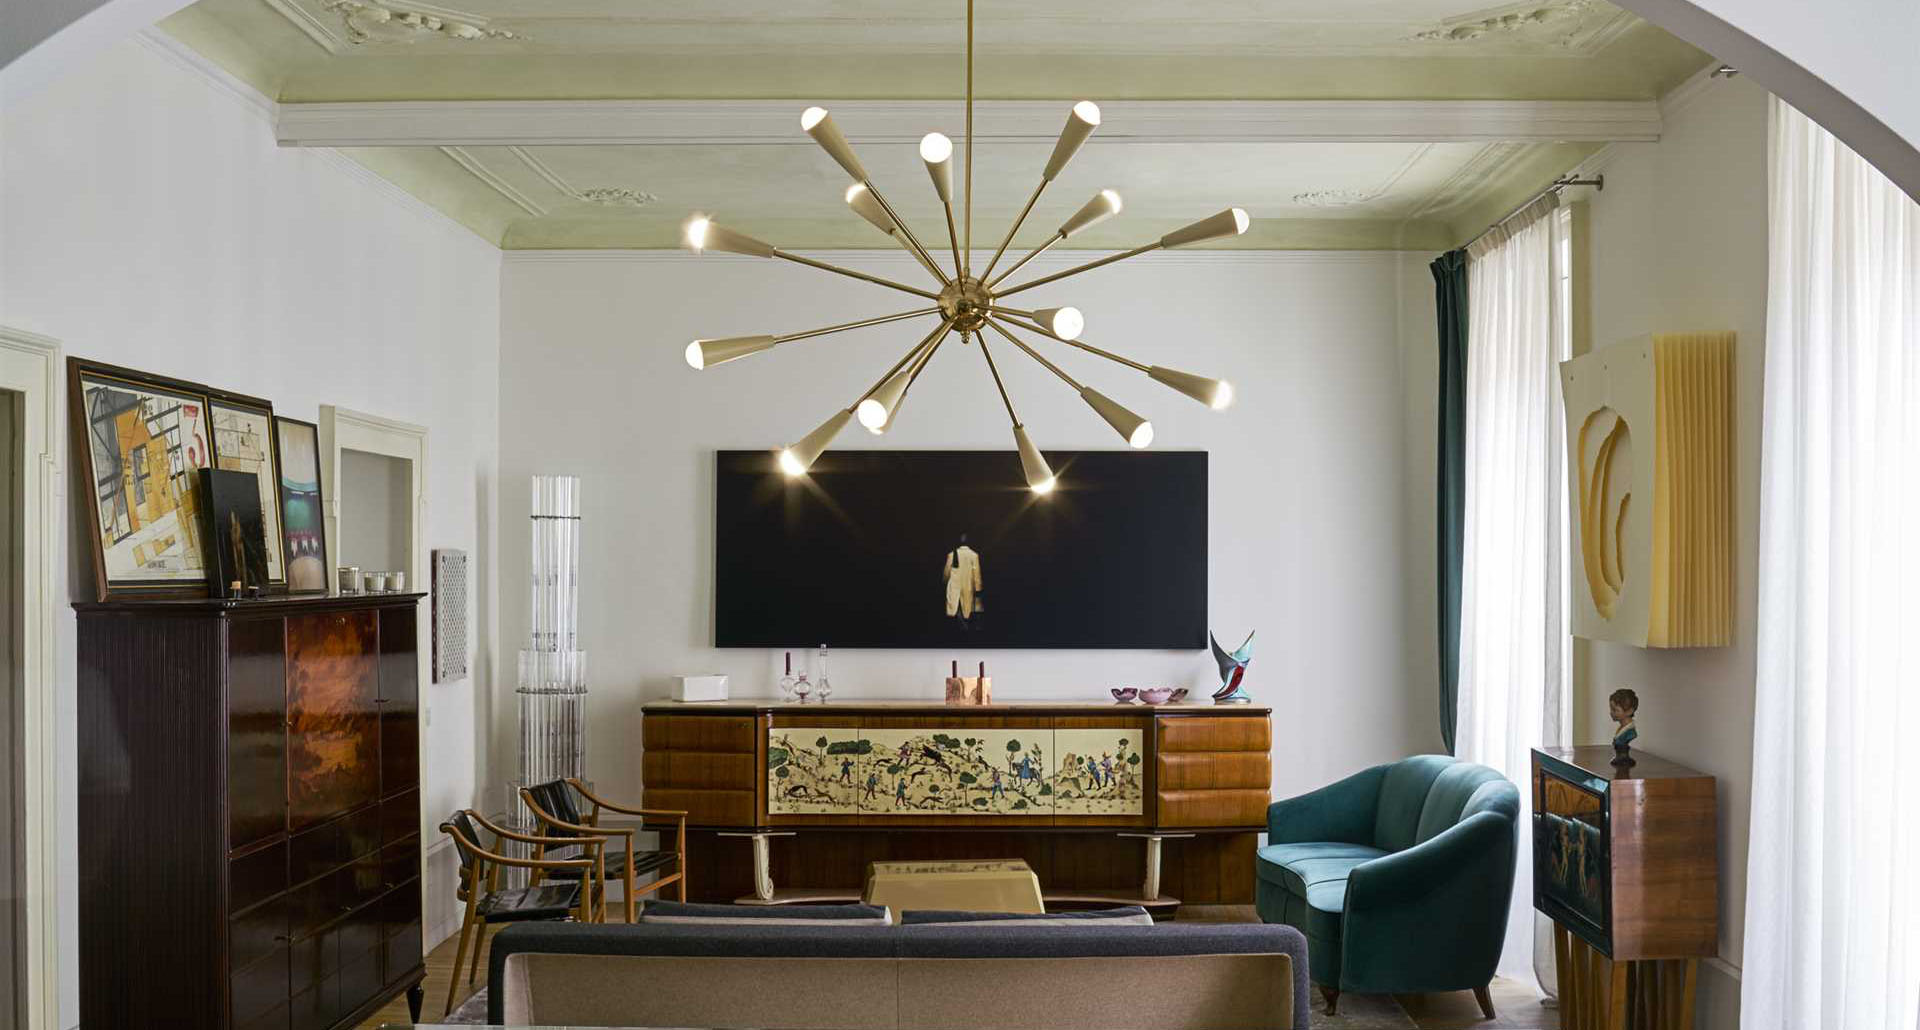 Linea Light relanza la legendaria marca de diseño Stilnovo